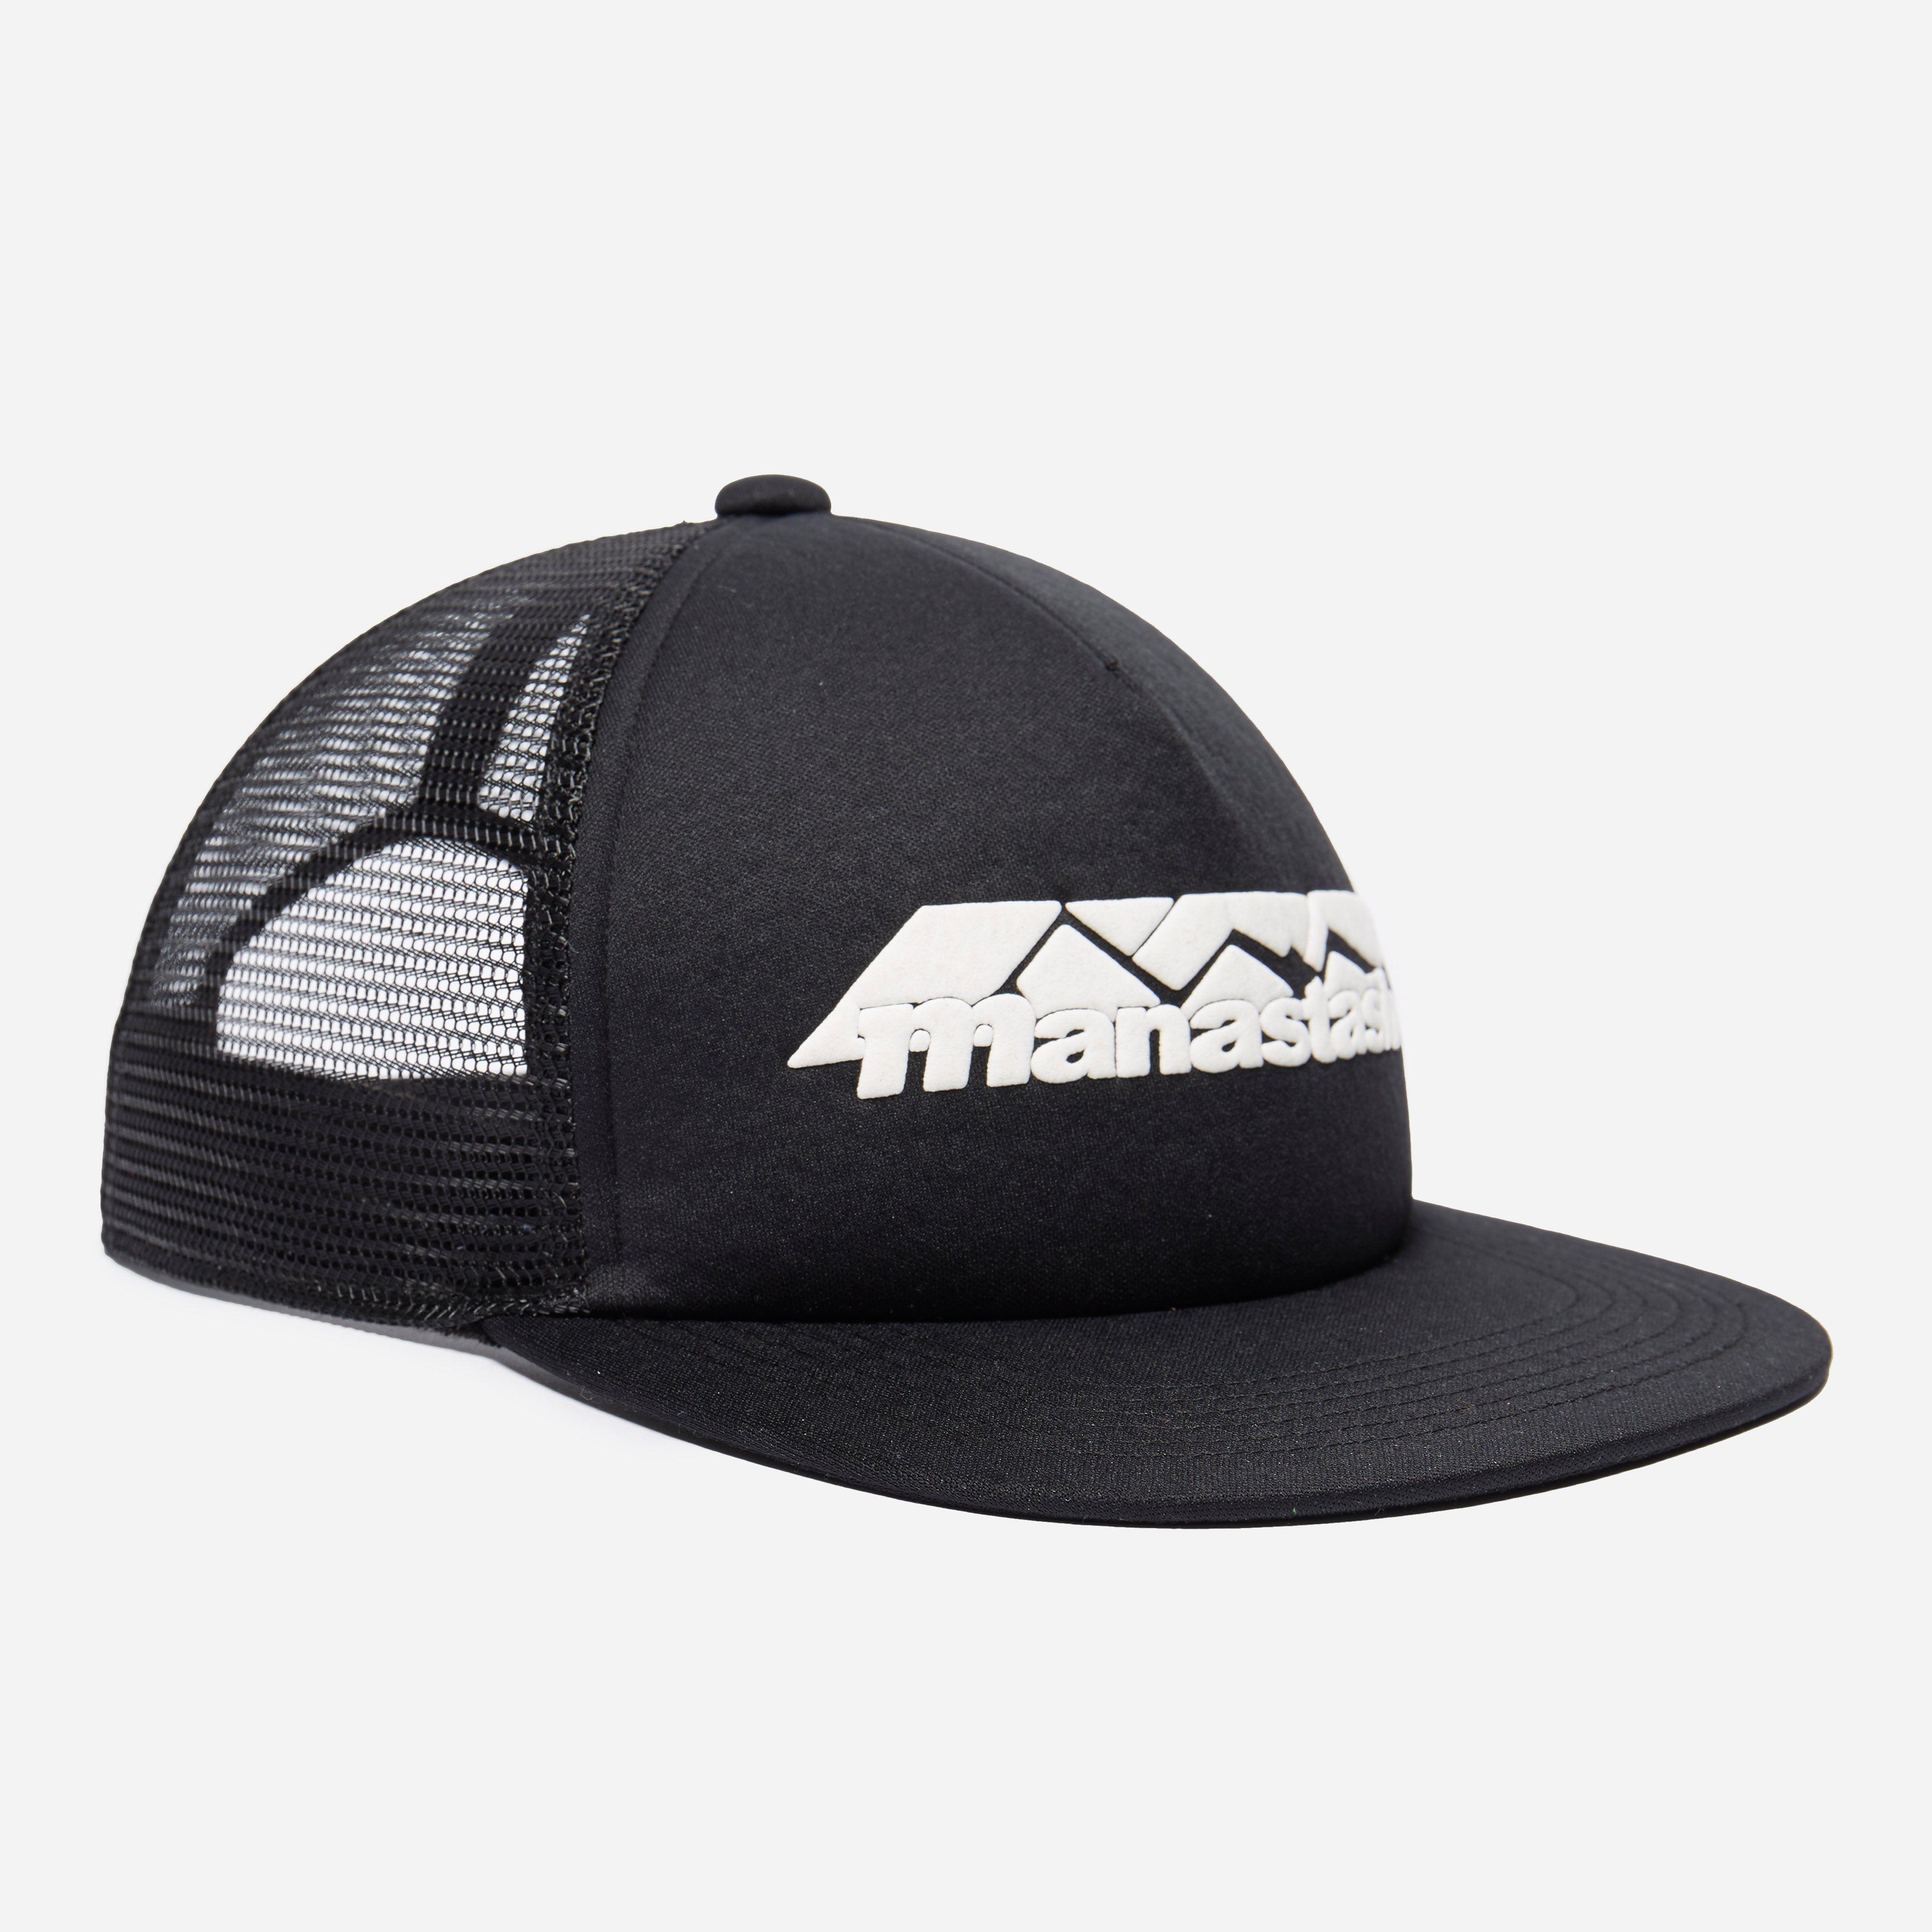 b255b74d0 Manastash Mountain Trucker Cap | The Hip Store